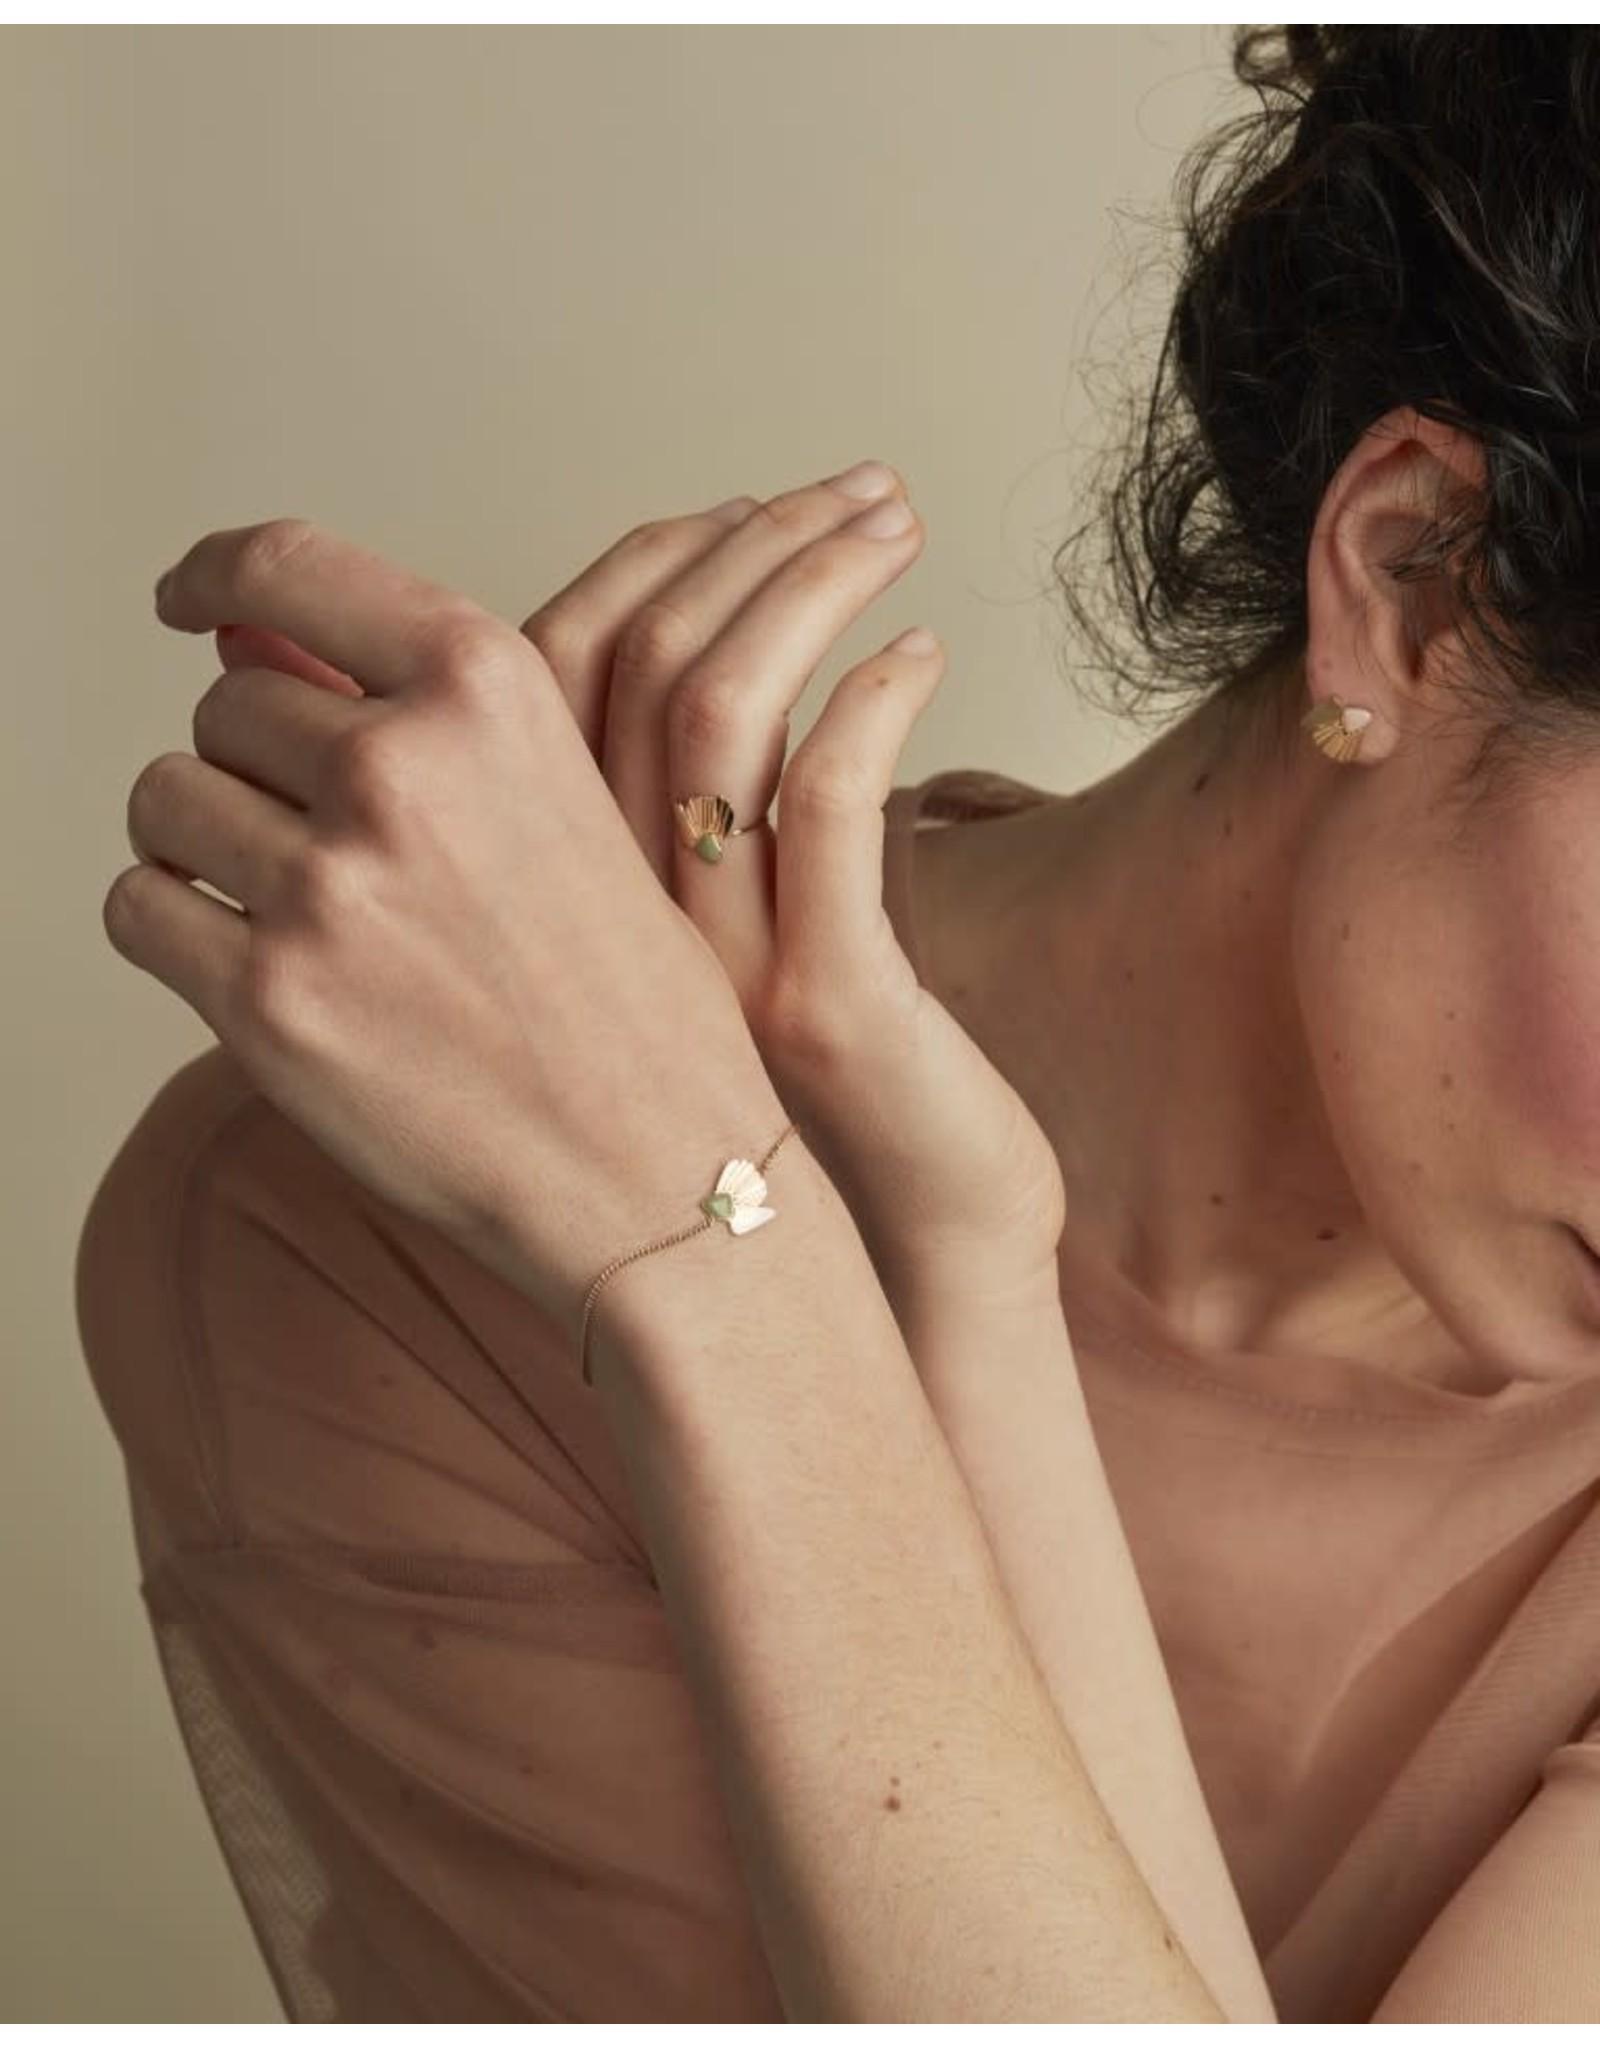 Nadja Carlotti Armband Coquillage - Oud roze - Messing verguld - Geïnspireerd op de rotsen van Lavezii eilanden - Lengt 16 cm + 2 cm - Patroon B 1,2 x H 1,2 cm